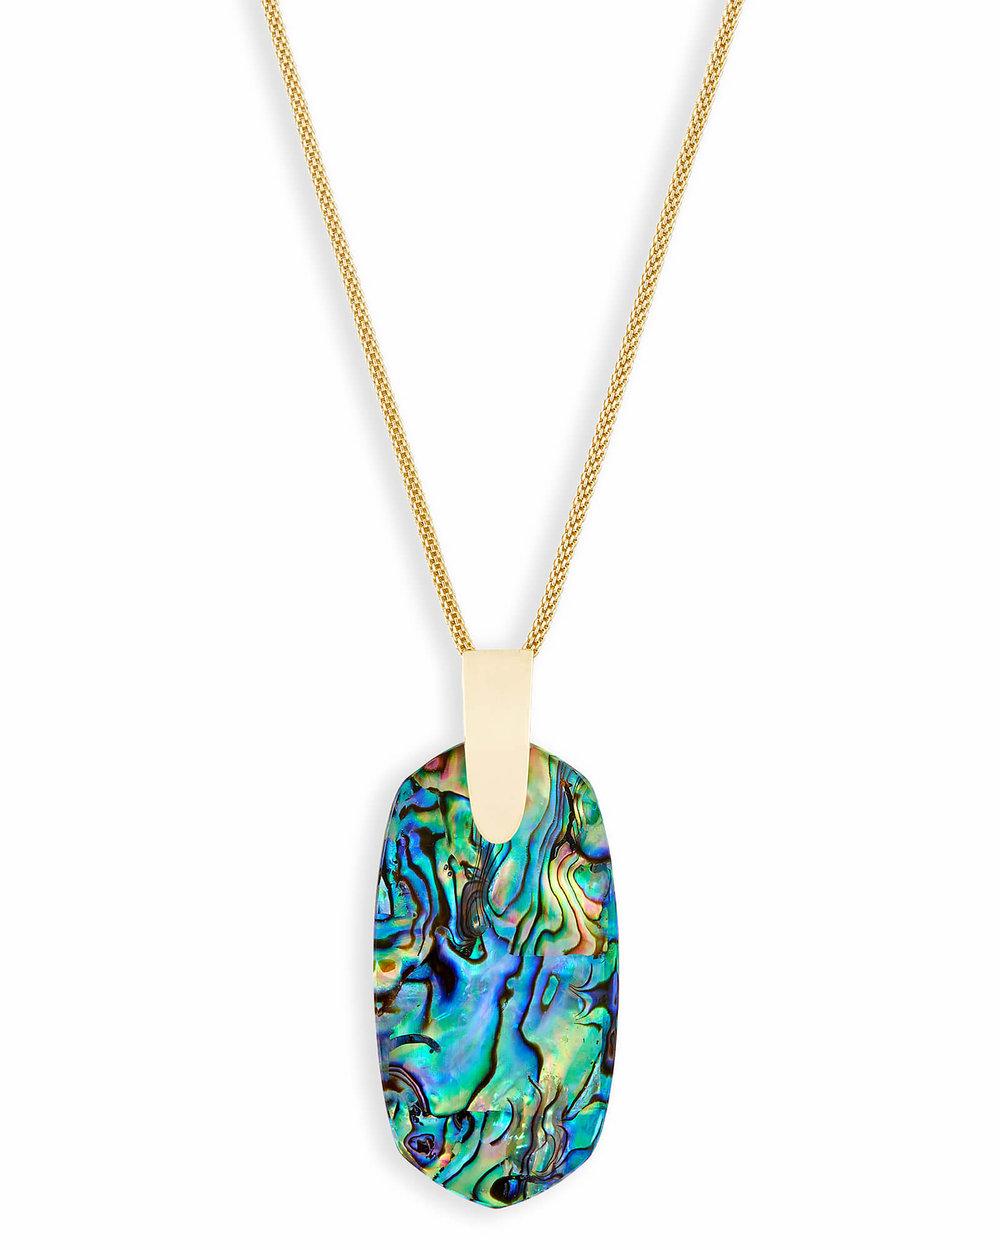 kendra-scott-inez-gold-long-pendant-necklace-in-abalone-shell_00_default_lg.jpg